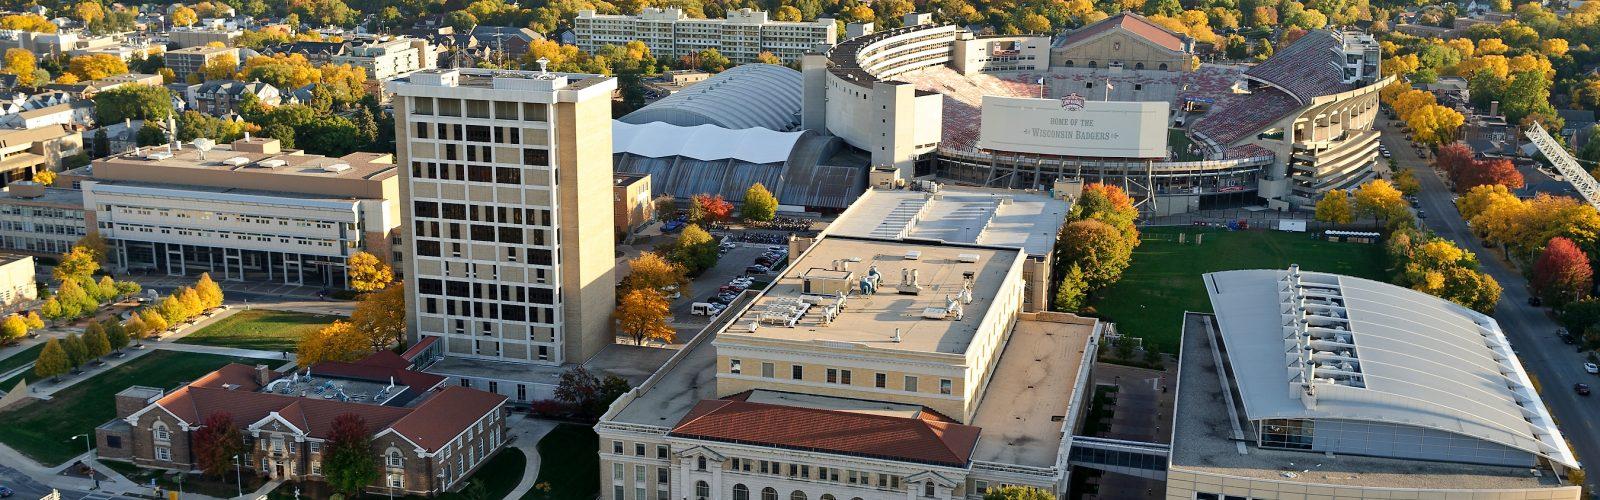 UW Engineering Campus Overhead Photo